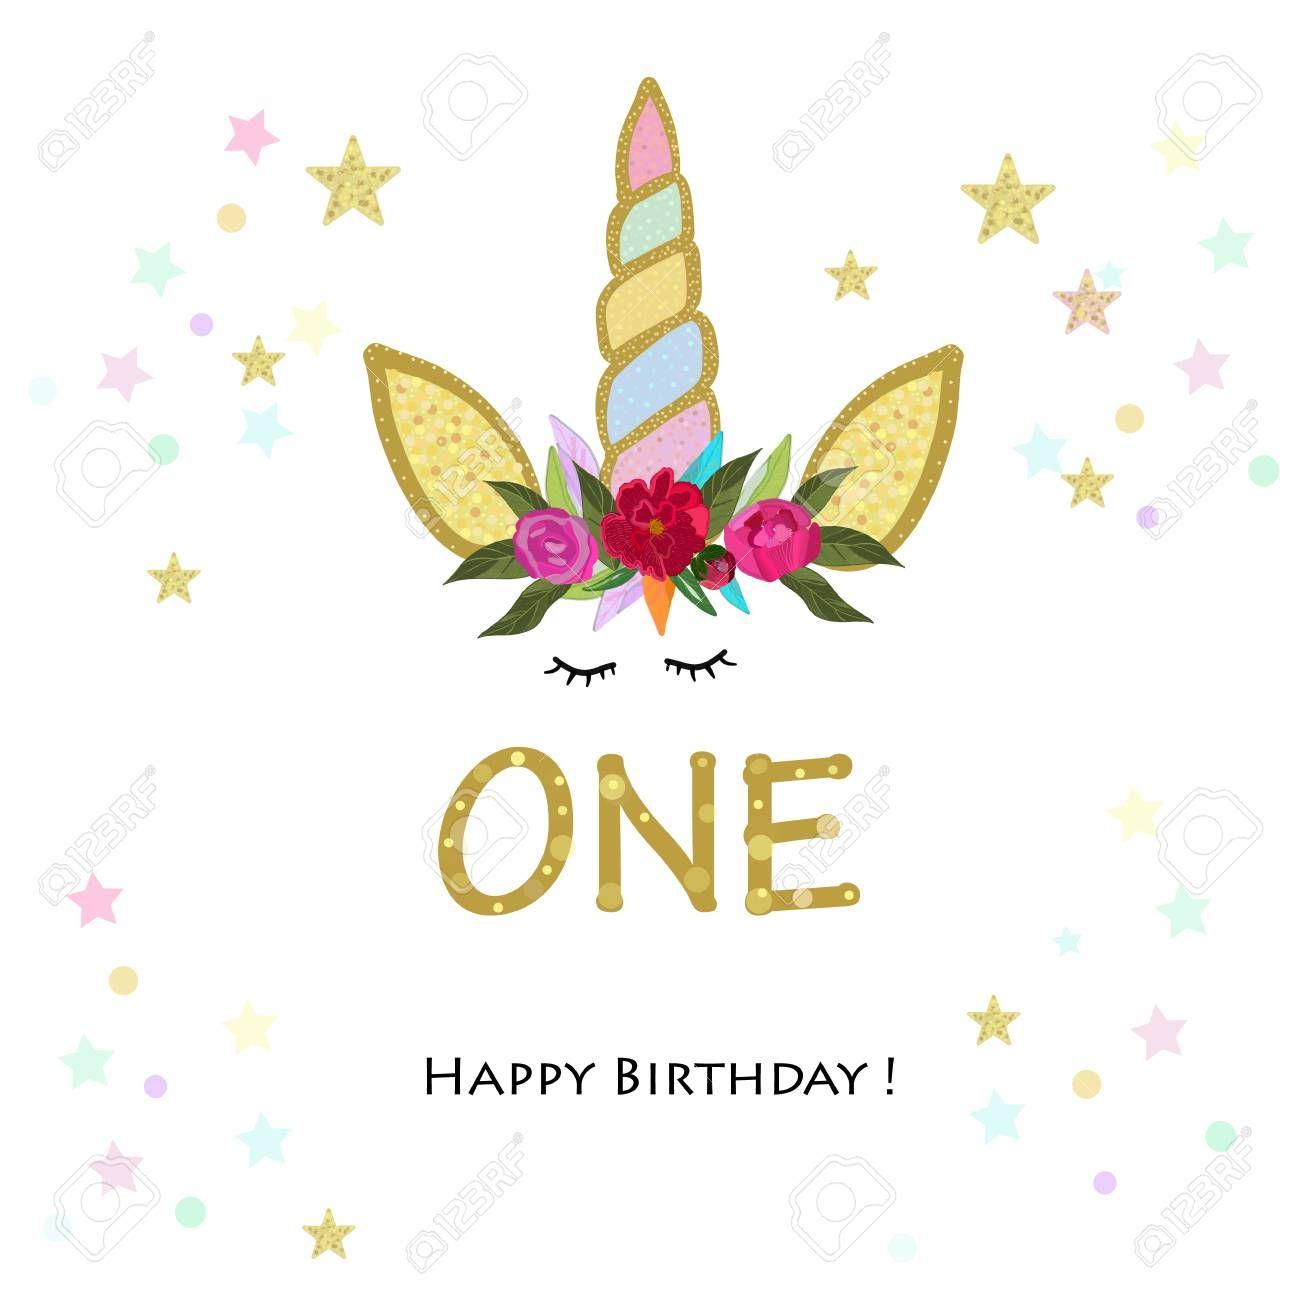 First Birtday Forward Unicorn Birthday Invitation Party Invitation Birthday Invitati Unicorn Birthday Invitations Invitation Card Birthday Birthday Invitations